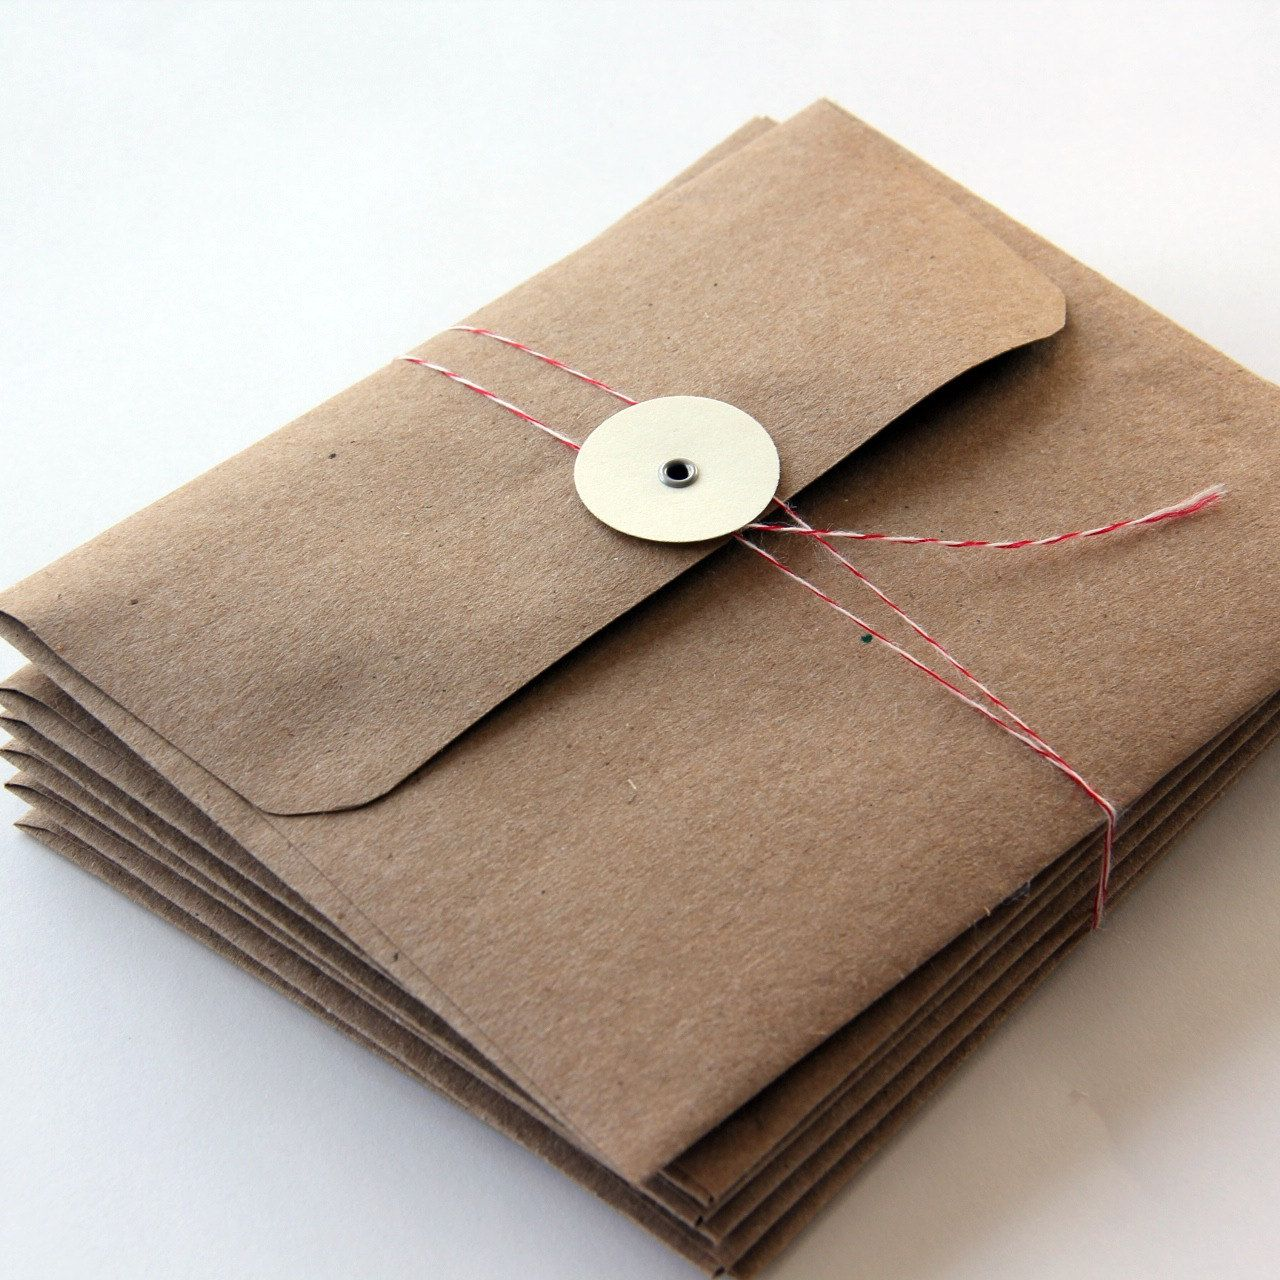 6 Kraft Envelopes With Button Tie Closure A2 Size 12 00 Via Etsy